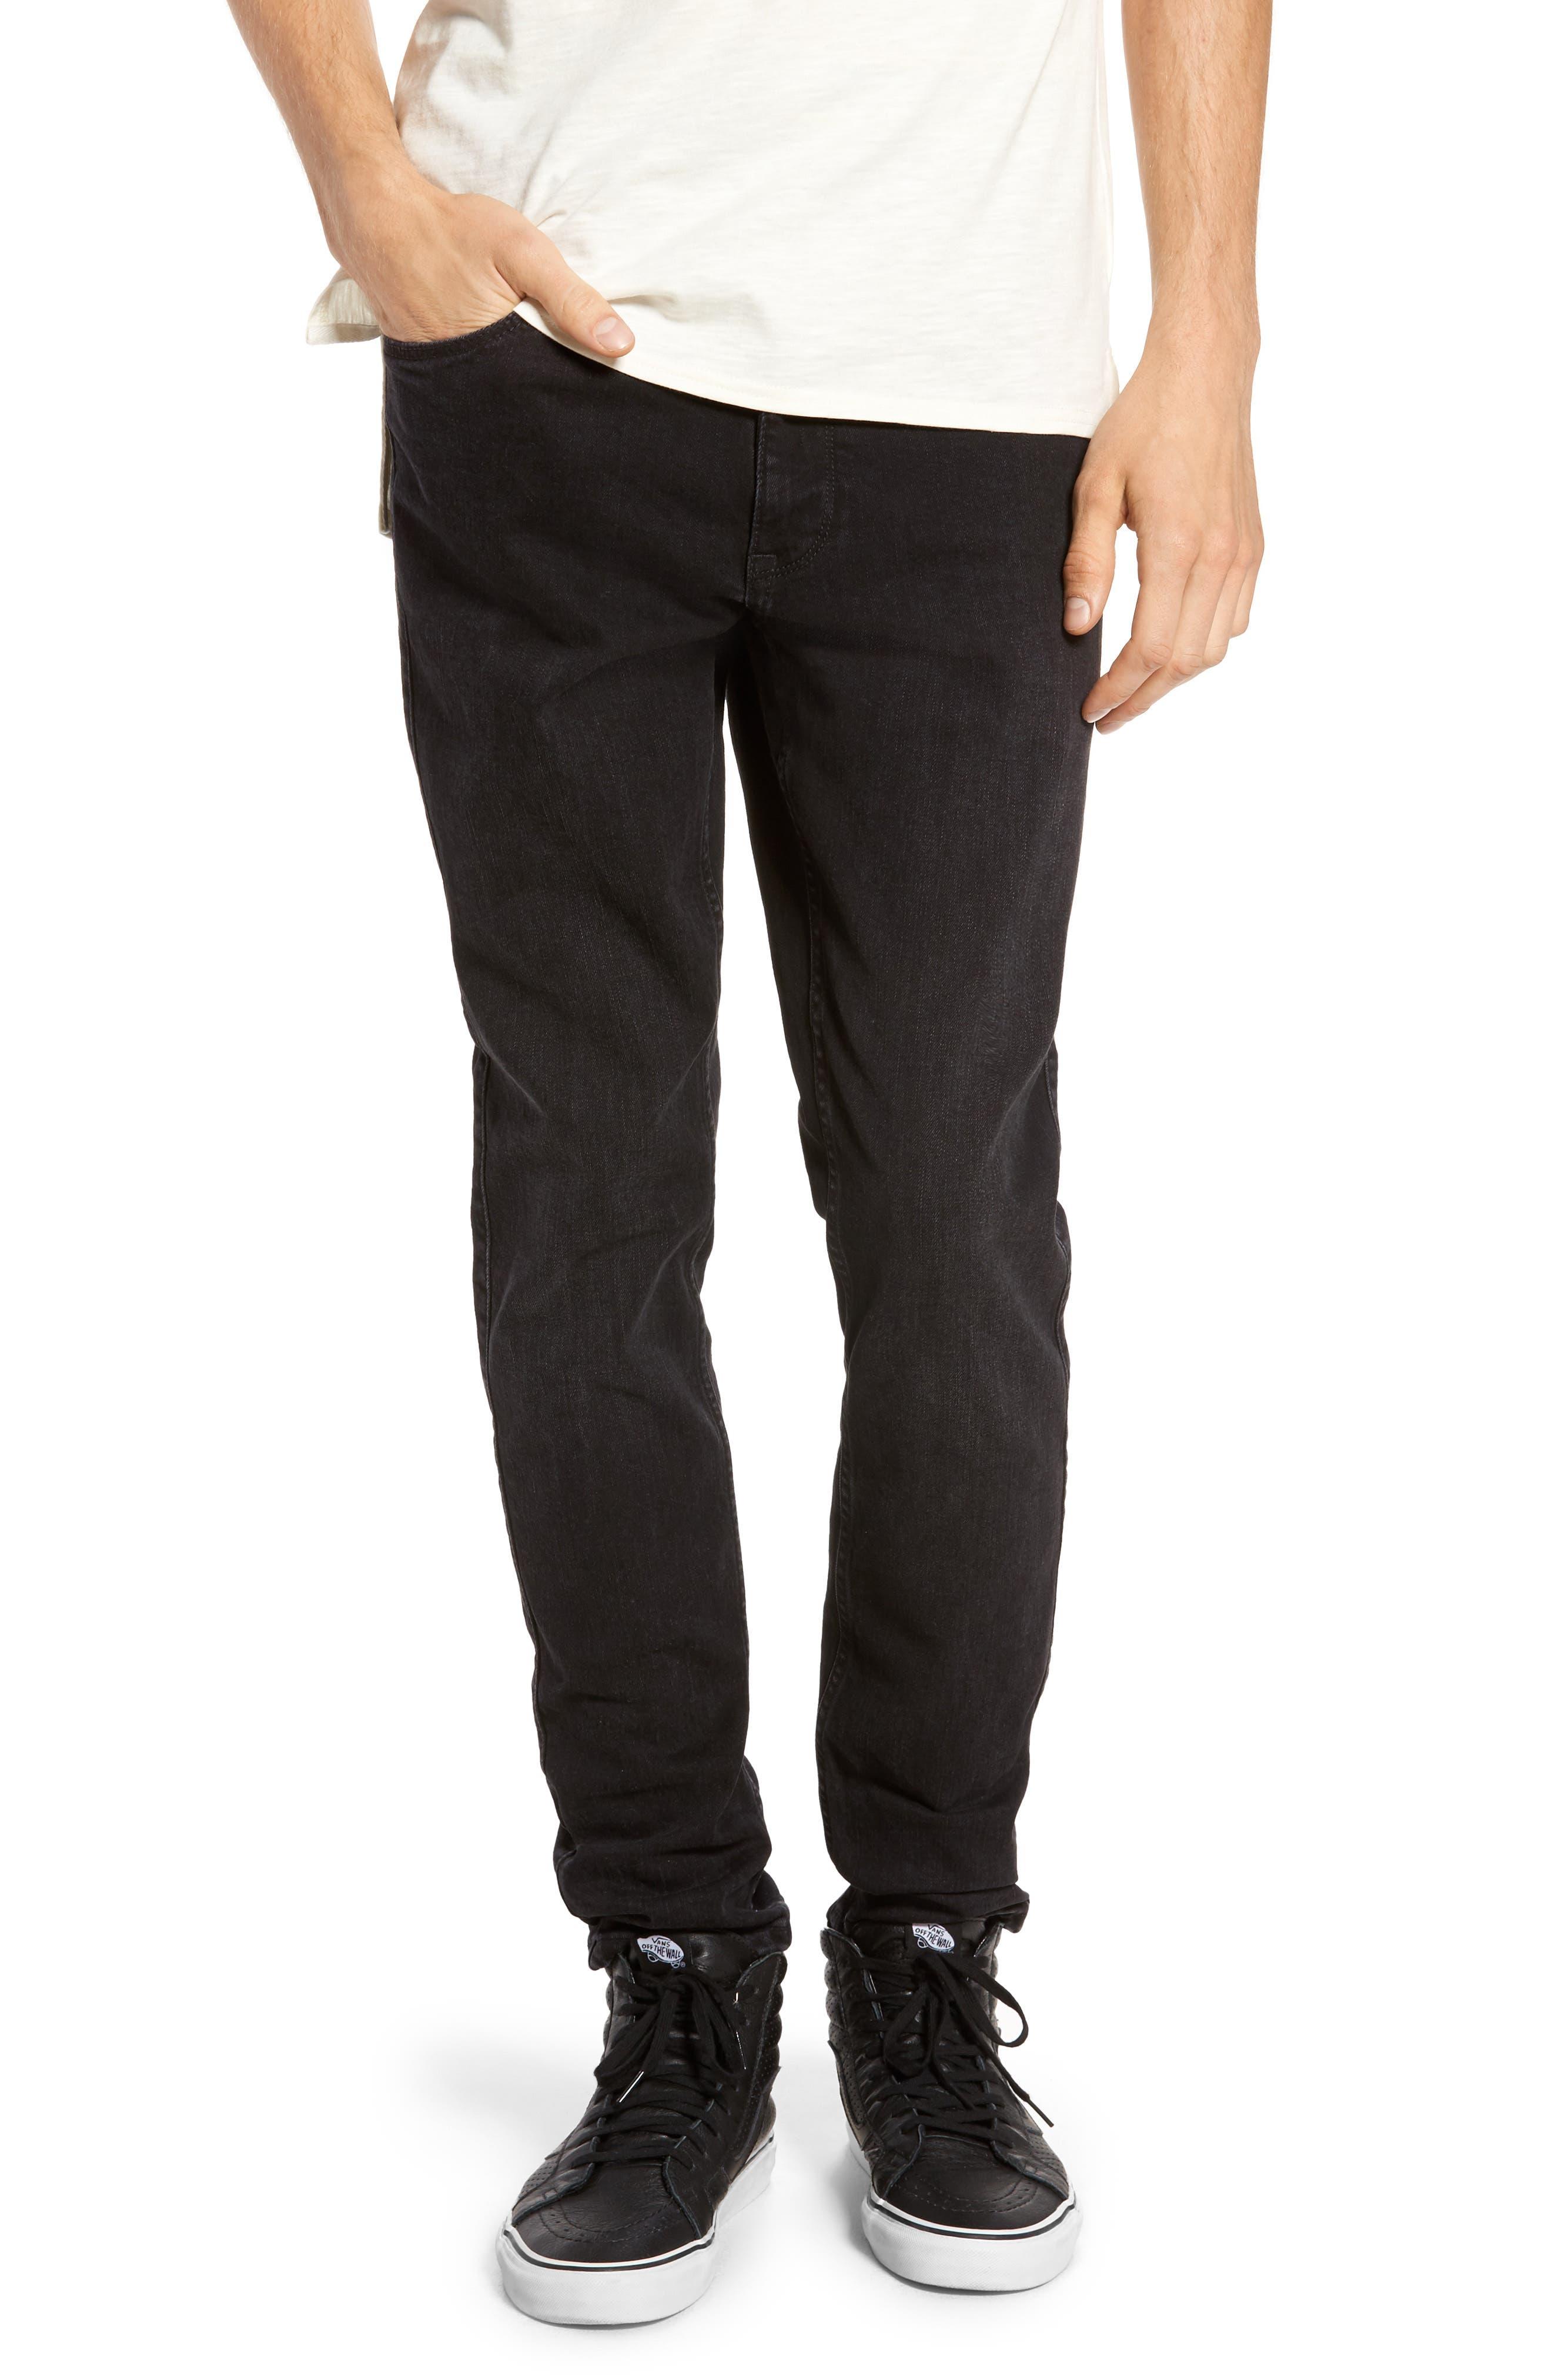 Alternate Image 1 Selected - Dr. Denim Supply Co. Clark Slim Straight Leg Jeans (Organic Worn Black)